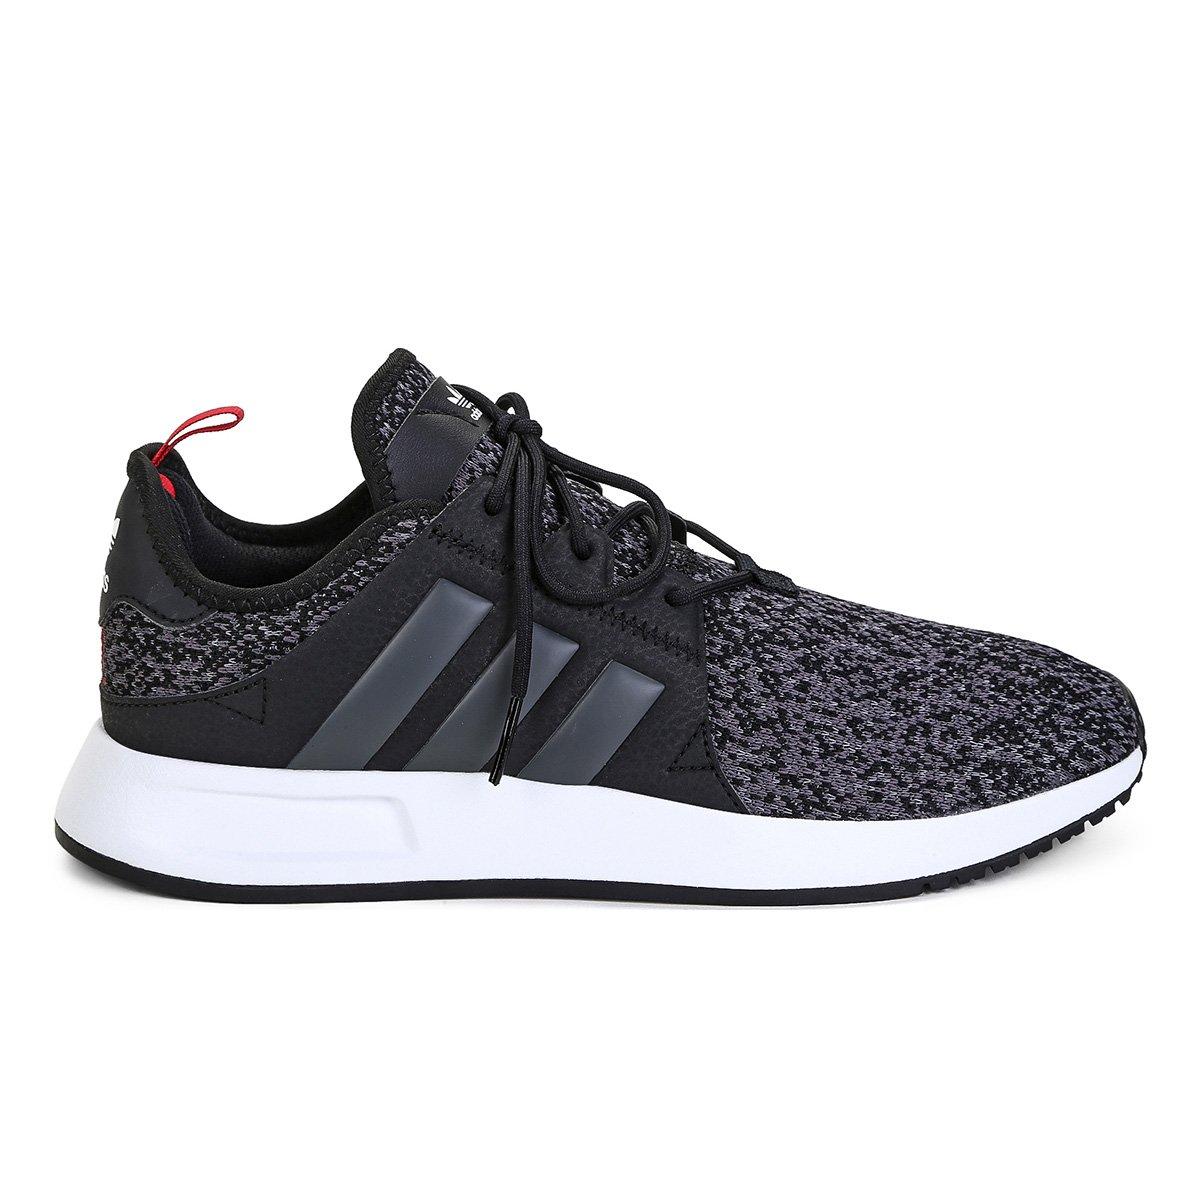 41db11f8170 Tênis Adidas X PLR - Compre Agora